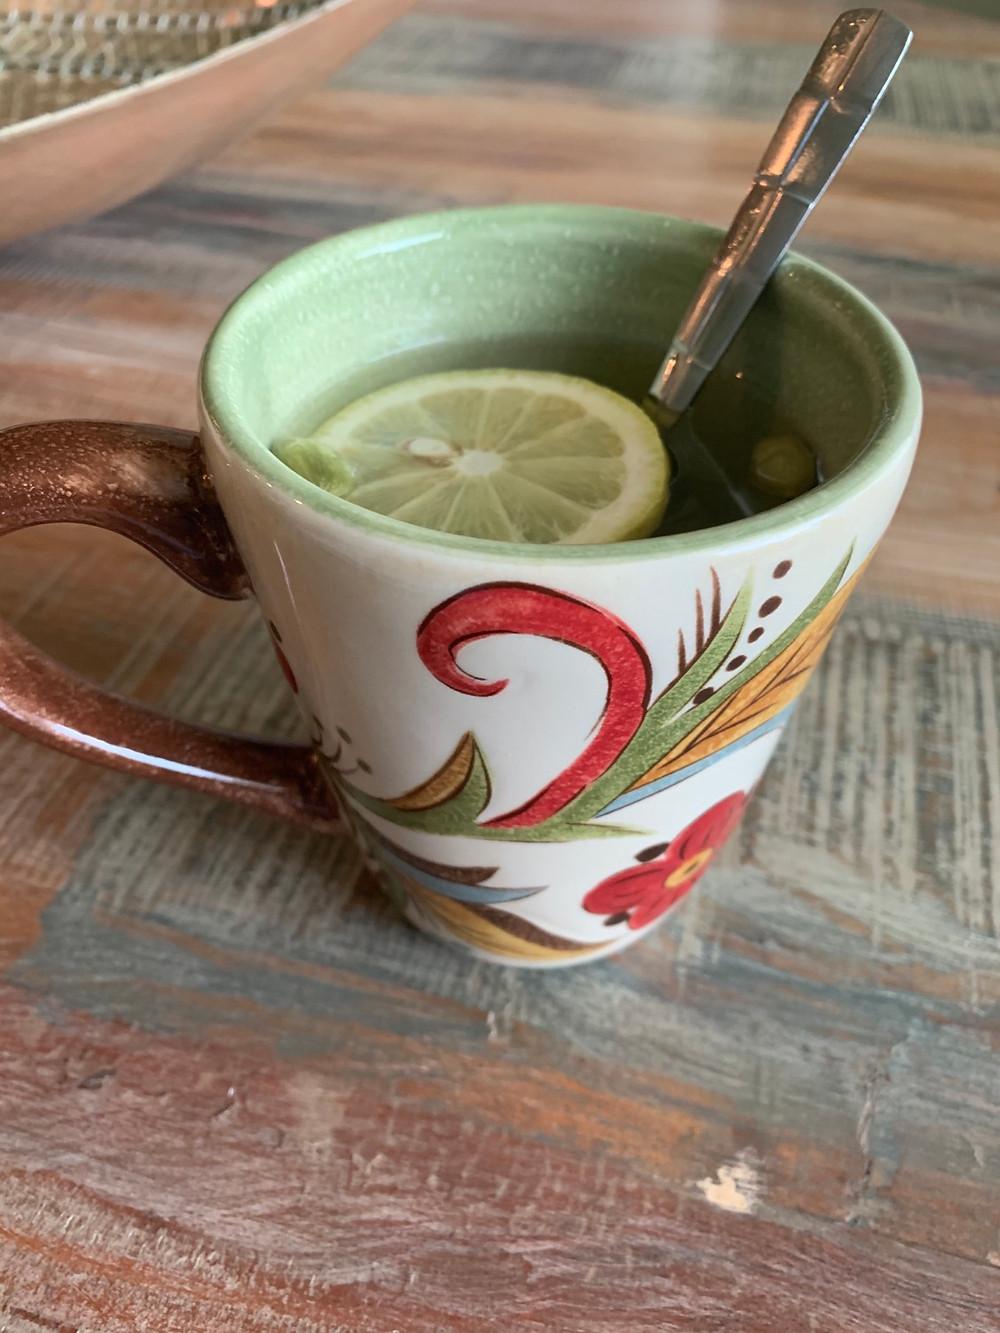 Warm cardamom tea is nurturing and healthy